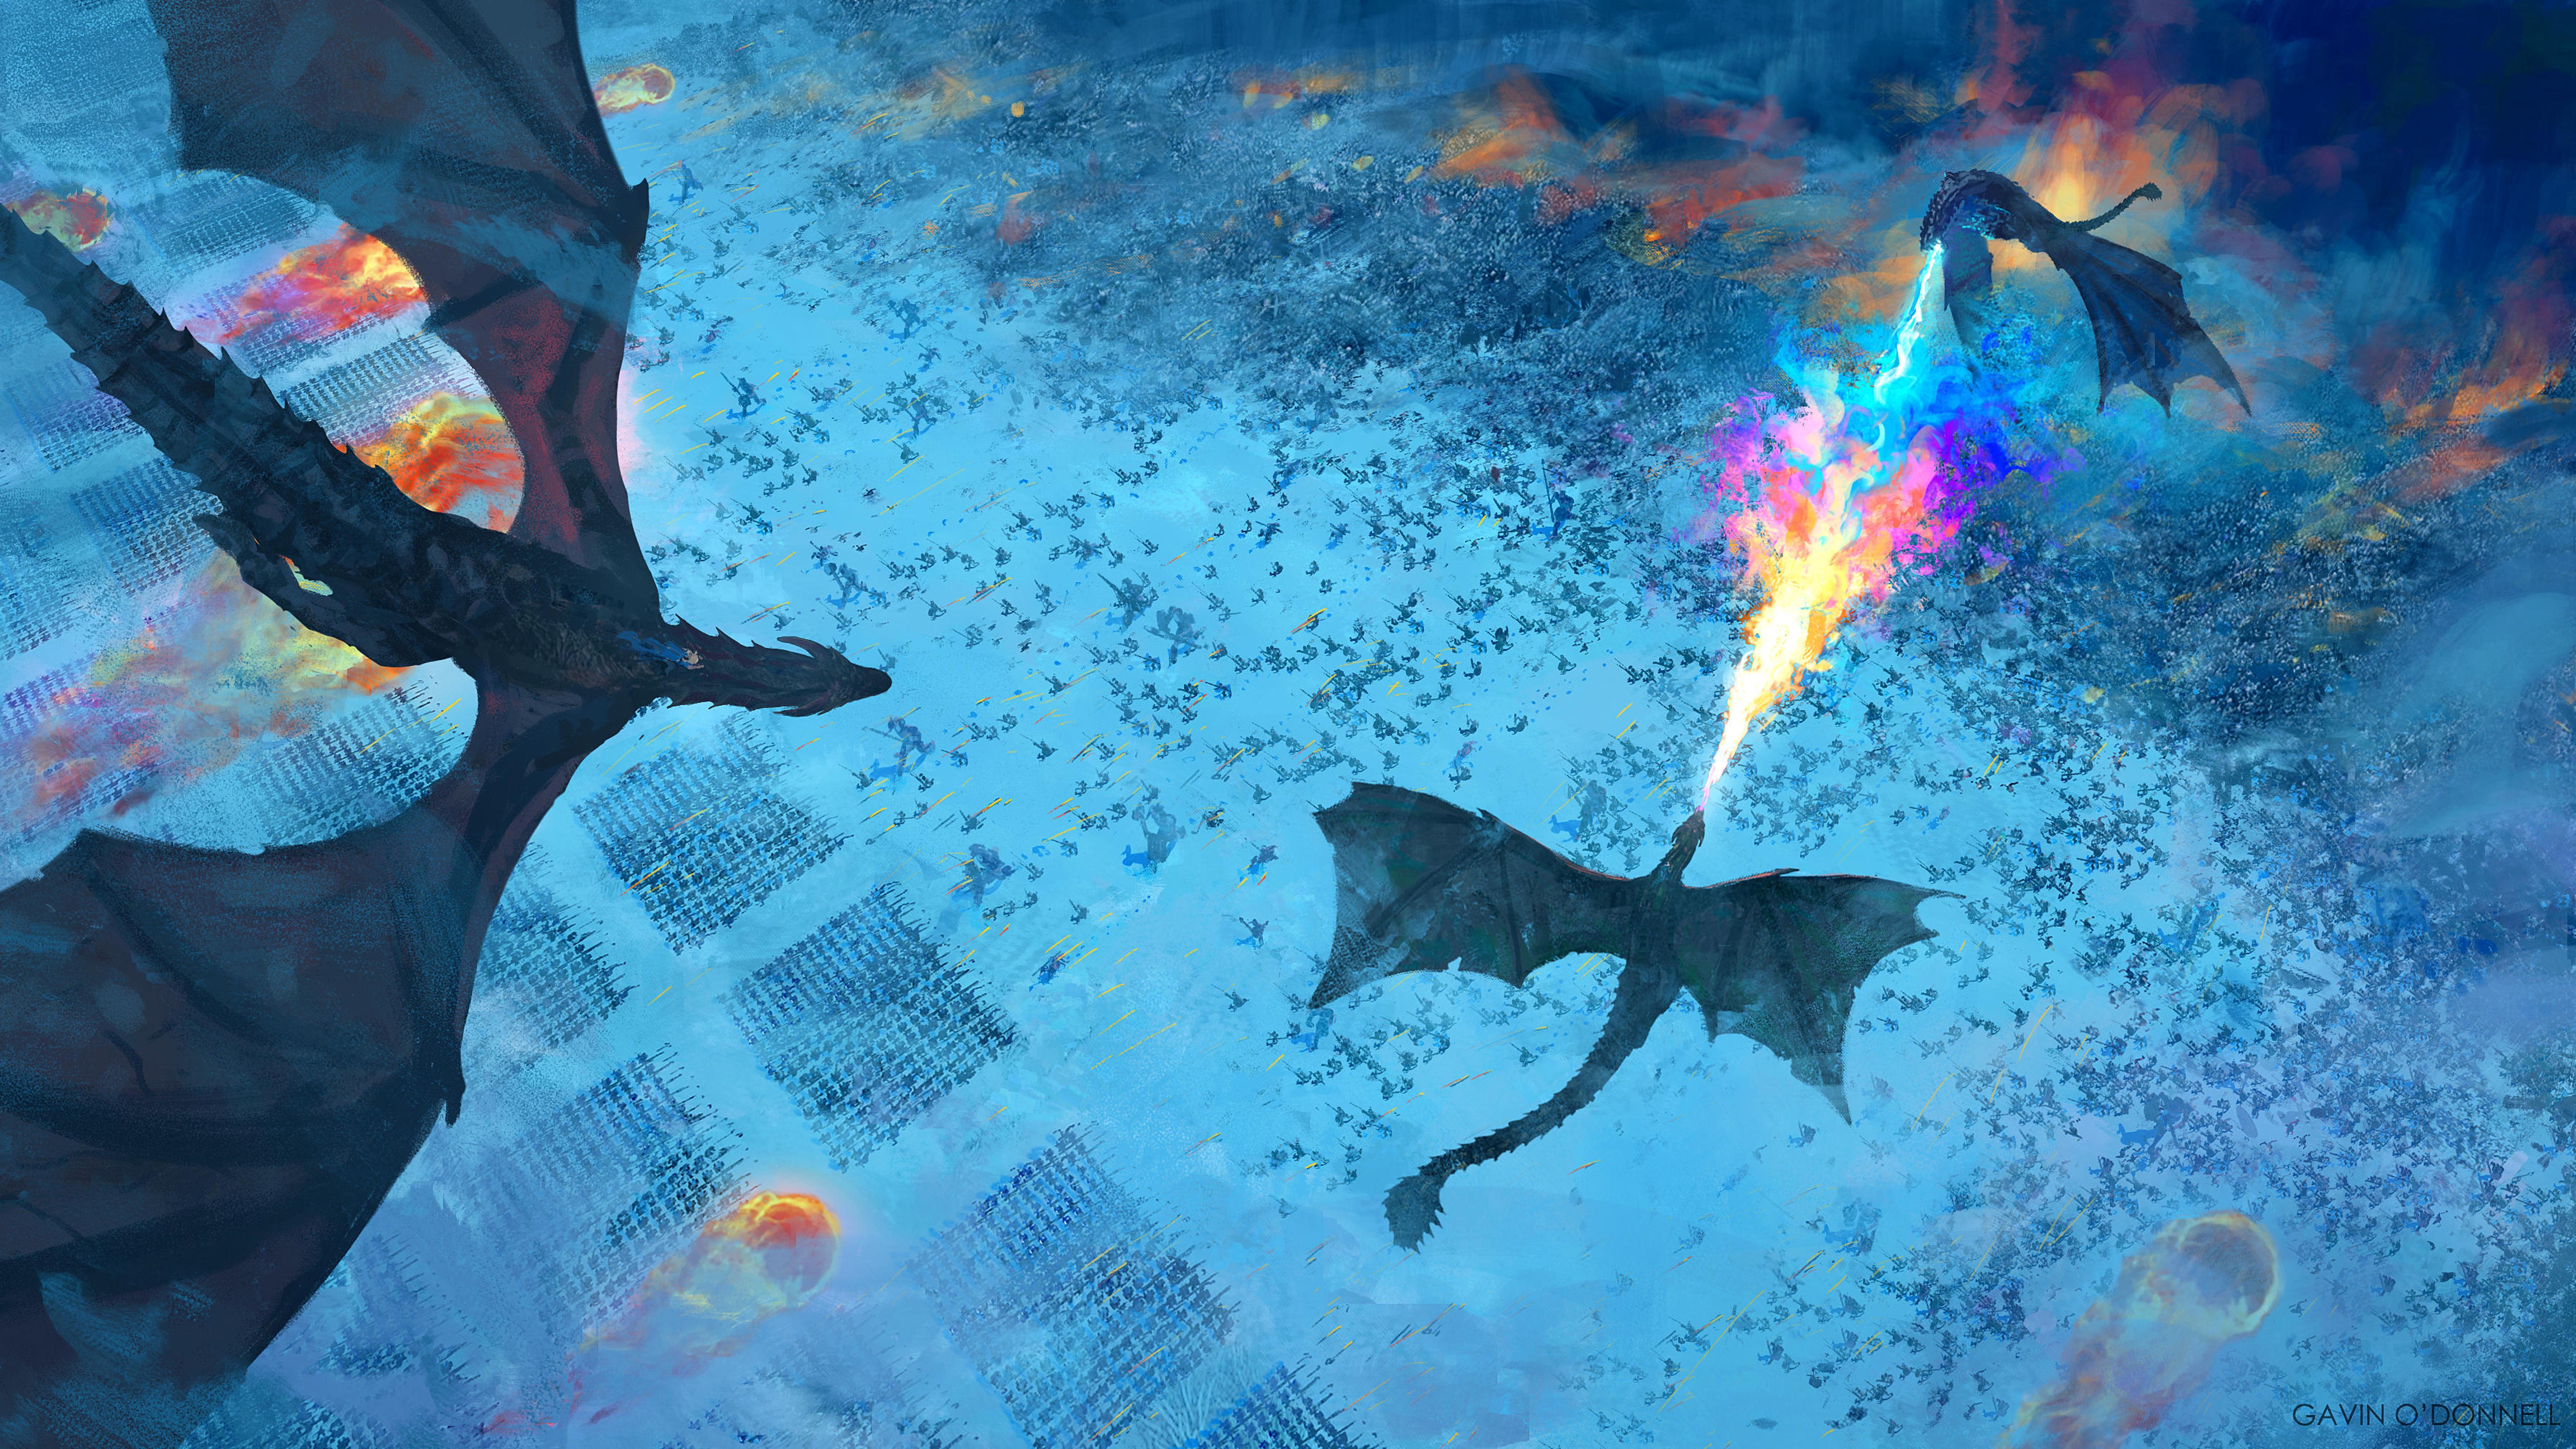 7680x4320 Battle Of Dragons Game Of Thrones 8 Art 8k Wallpaper Hd